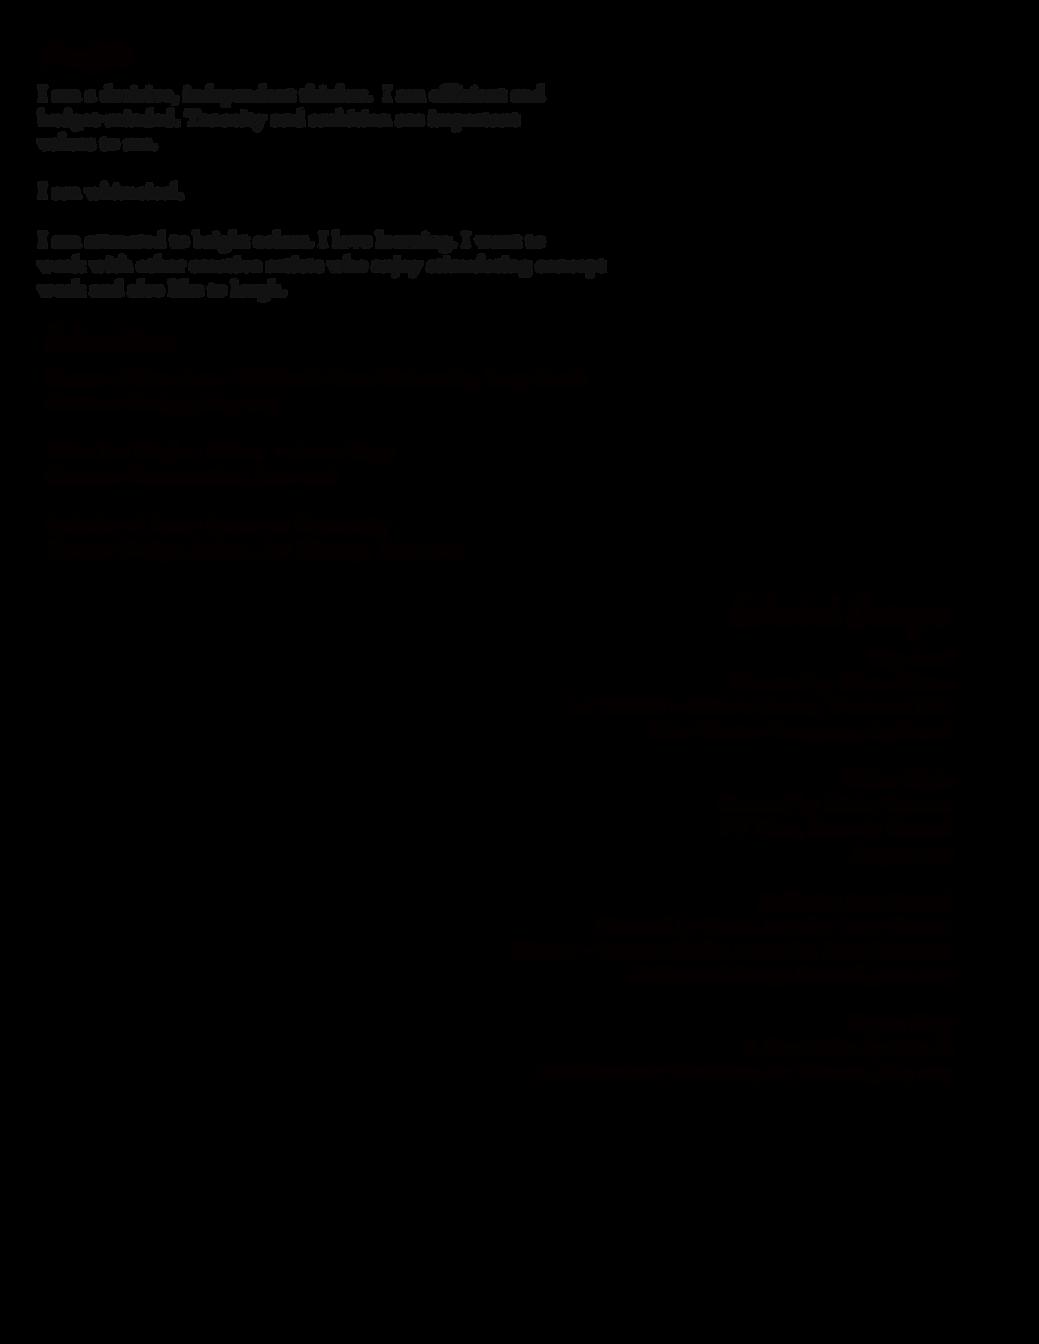 elena flores costume design resume costume design portfolio los angeles middot pdf extended cv